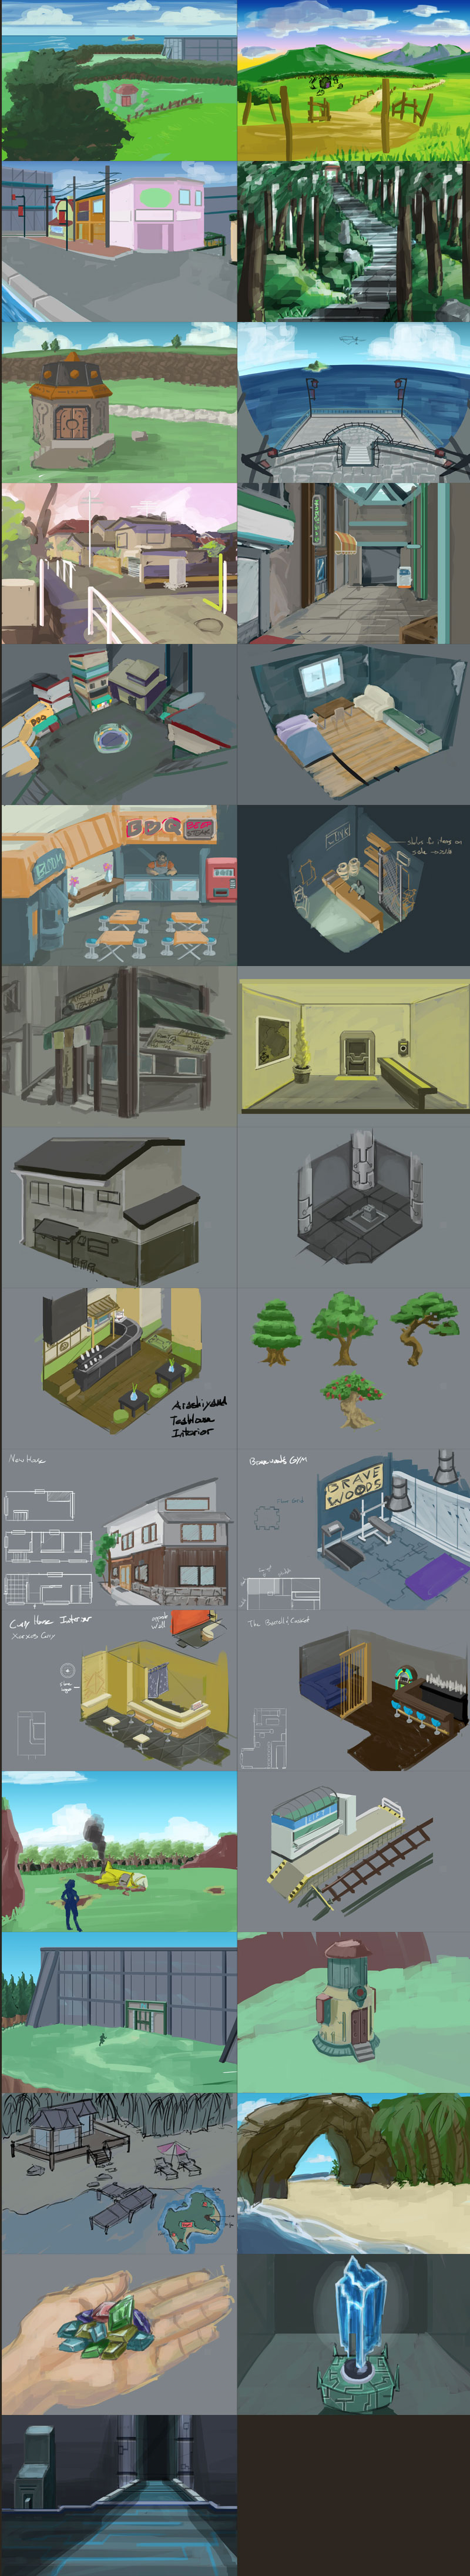 ArtDump1 Environments